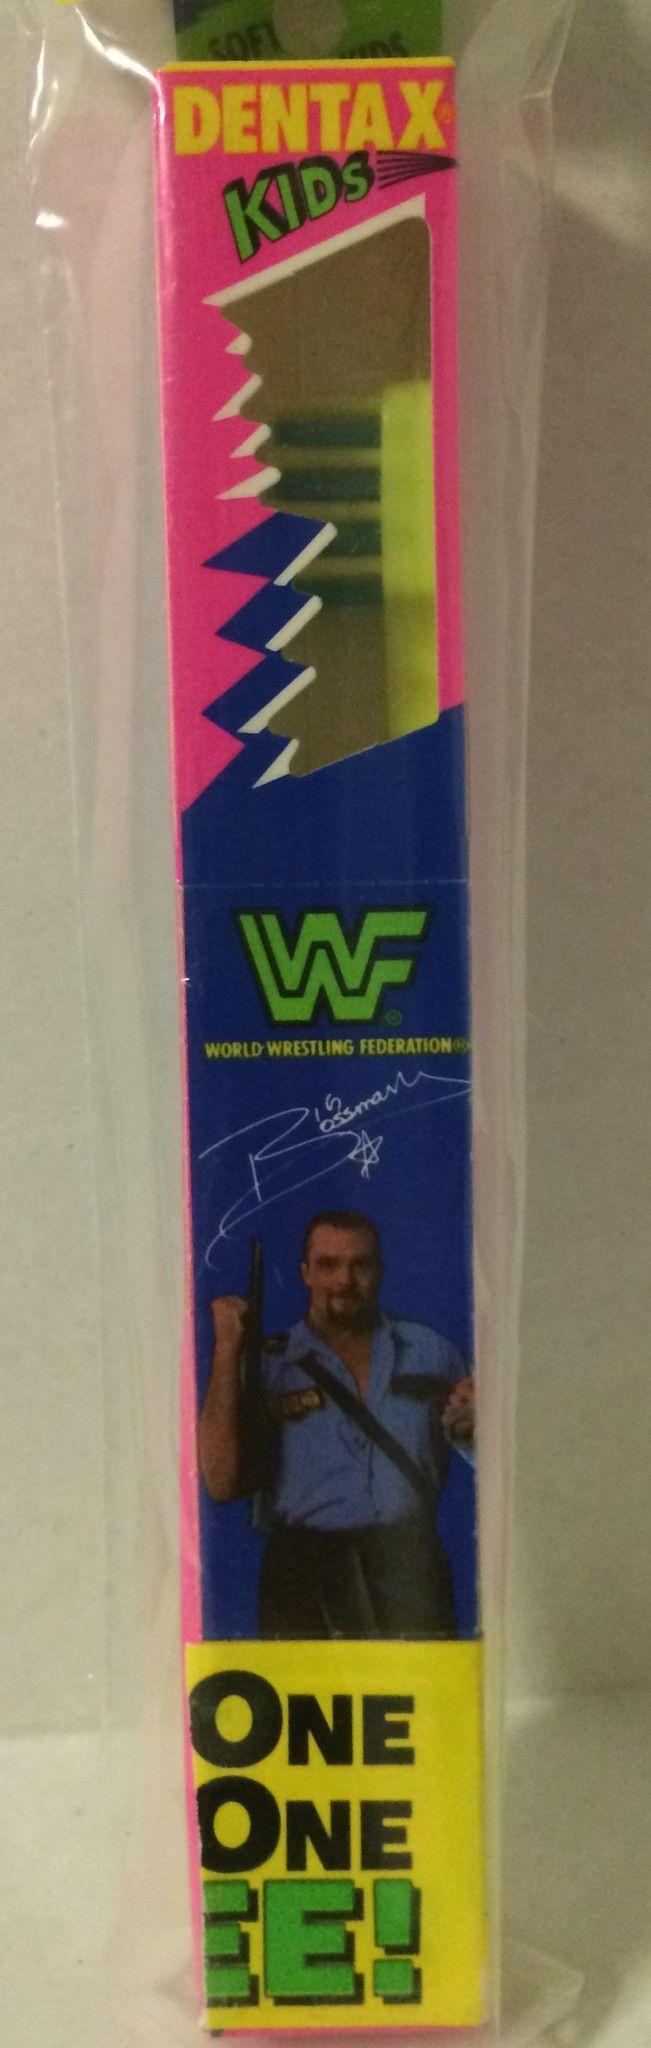 (GBS04639) - WWF WWE WCW nWo Wrestling Dentax Kids Toothbrush - Big Boss Man